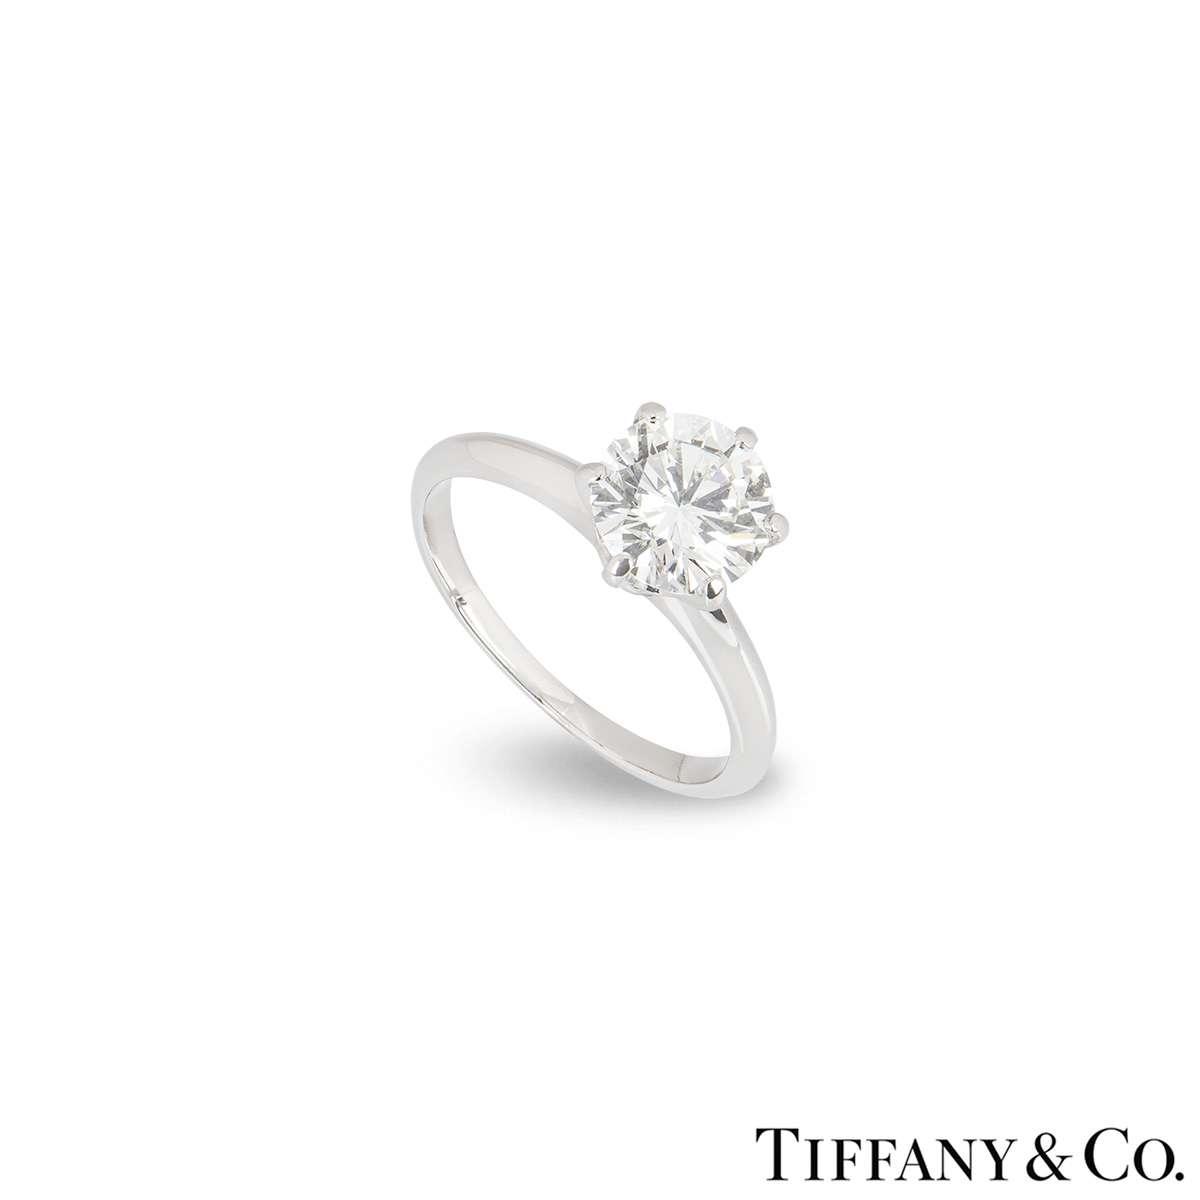 Tiffany & Co. Platinum Diamond Setting Ring 1.69ct I/VVS2